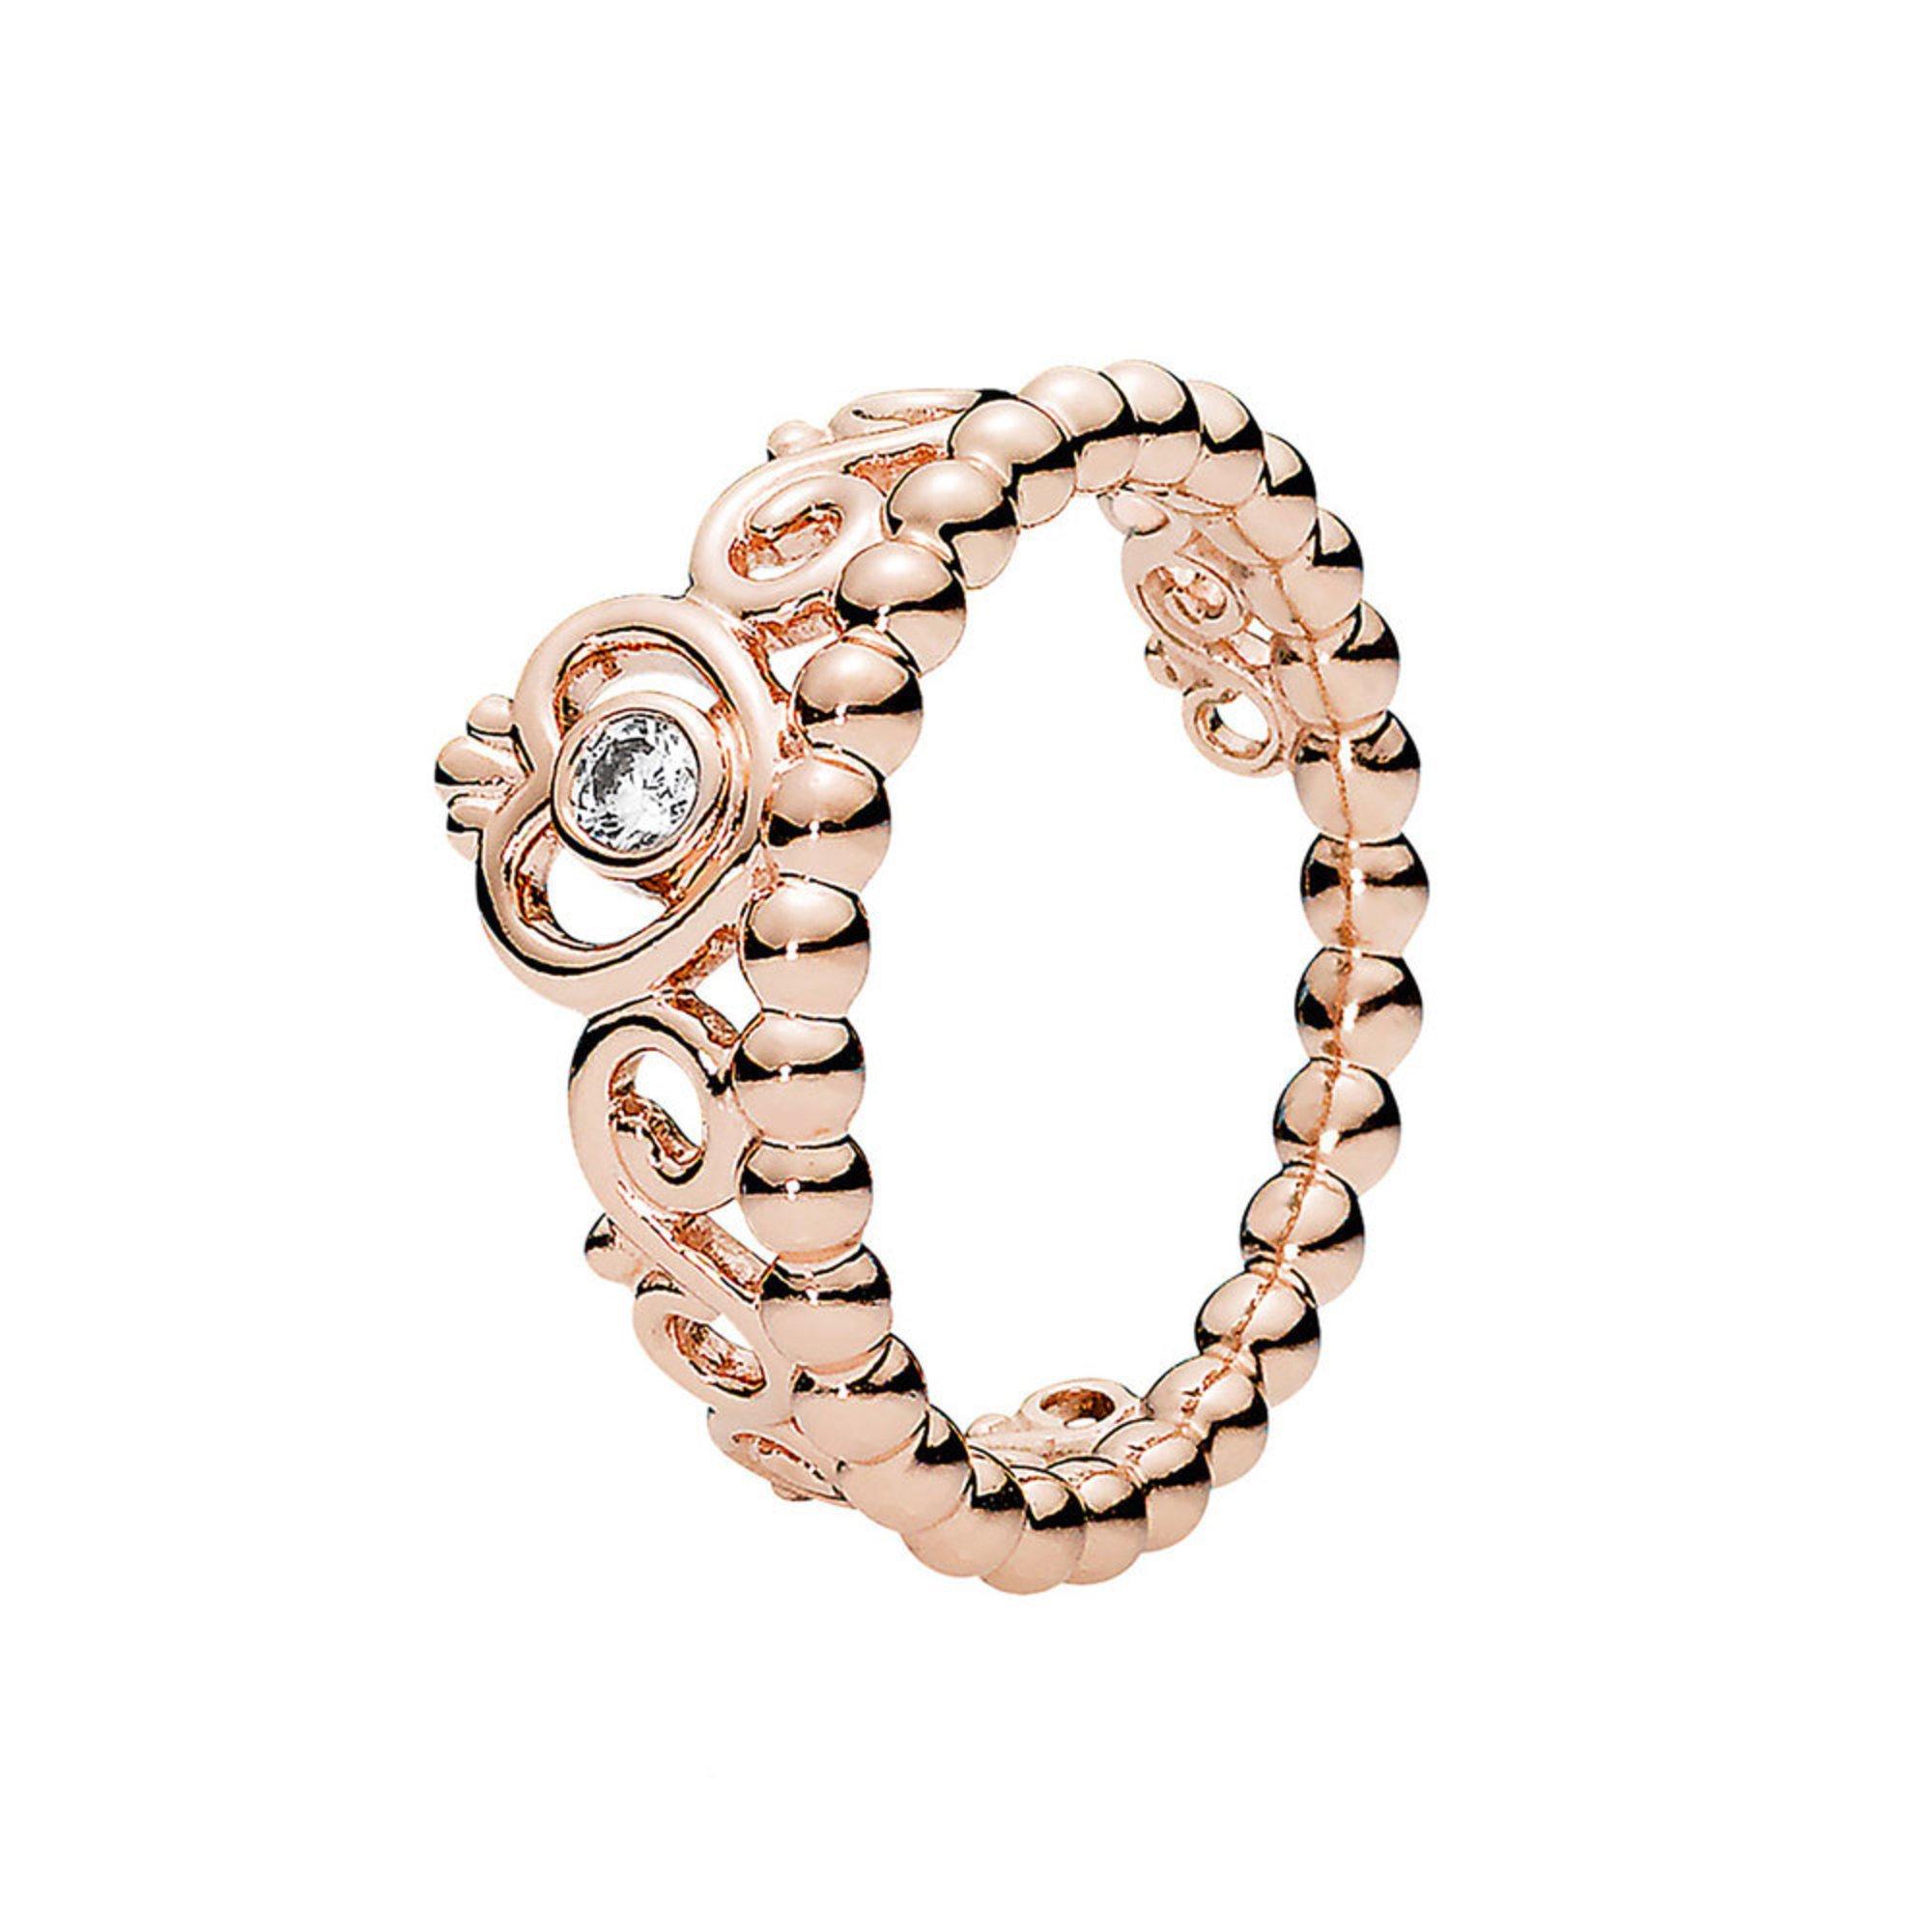 70f056153 Pandora Rose™ My Princess Tiara Ring, Clear Cubic Zirconia - Size 6 ...